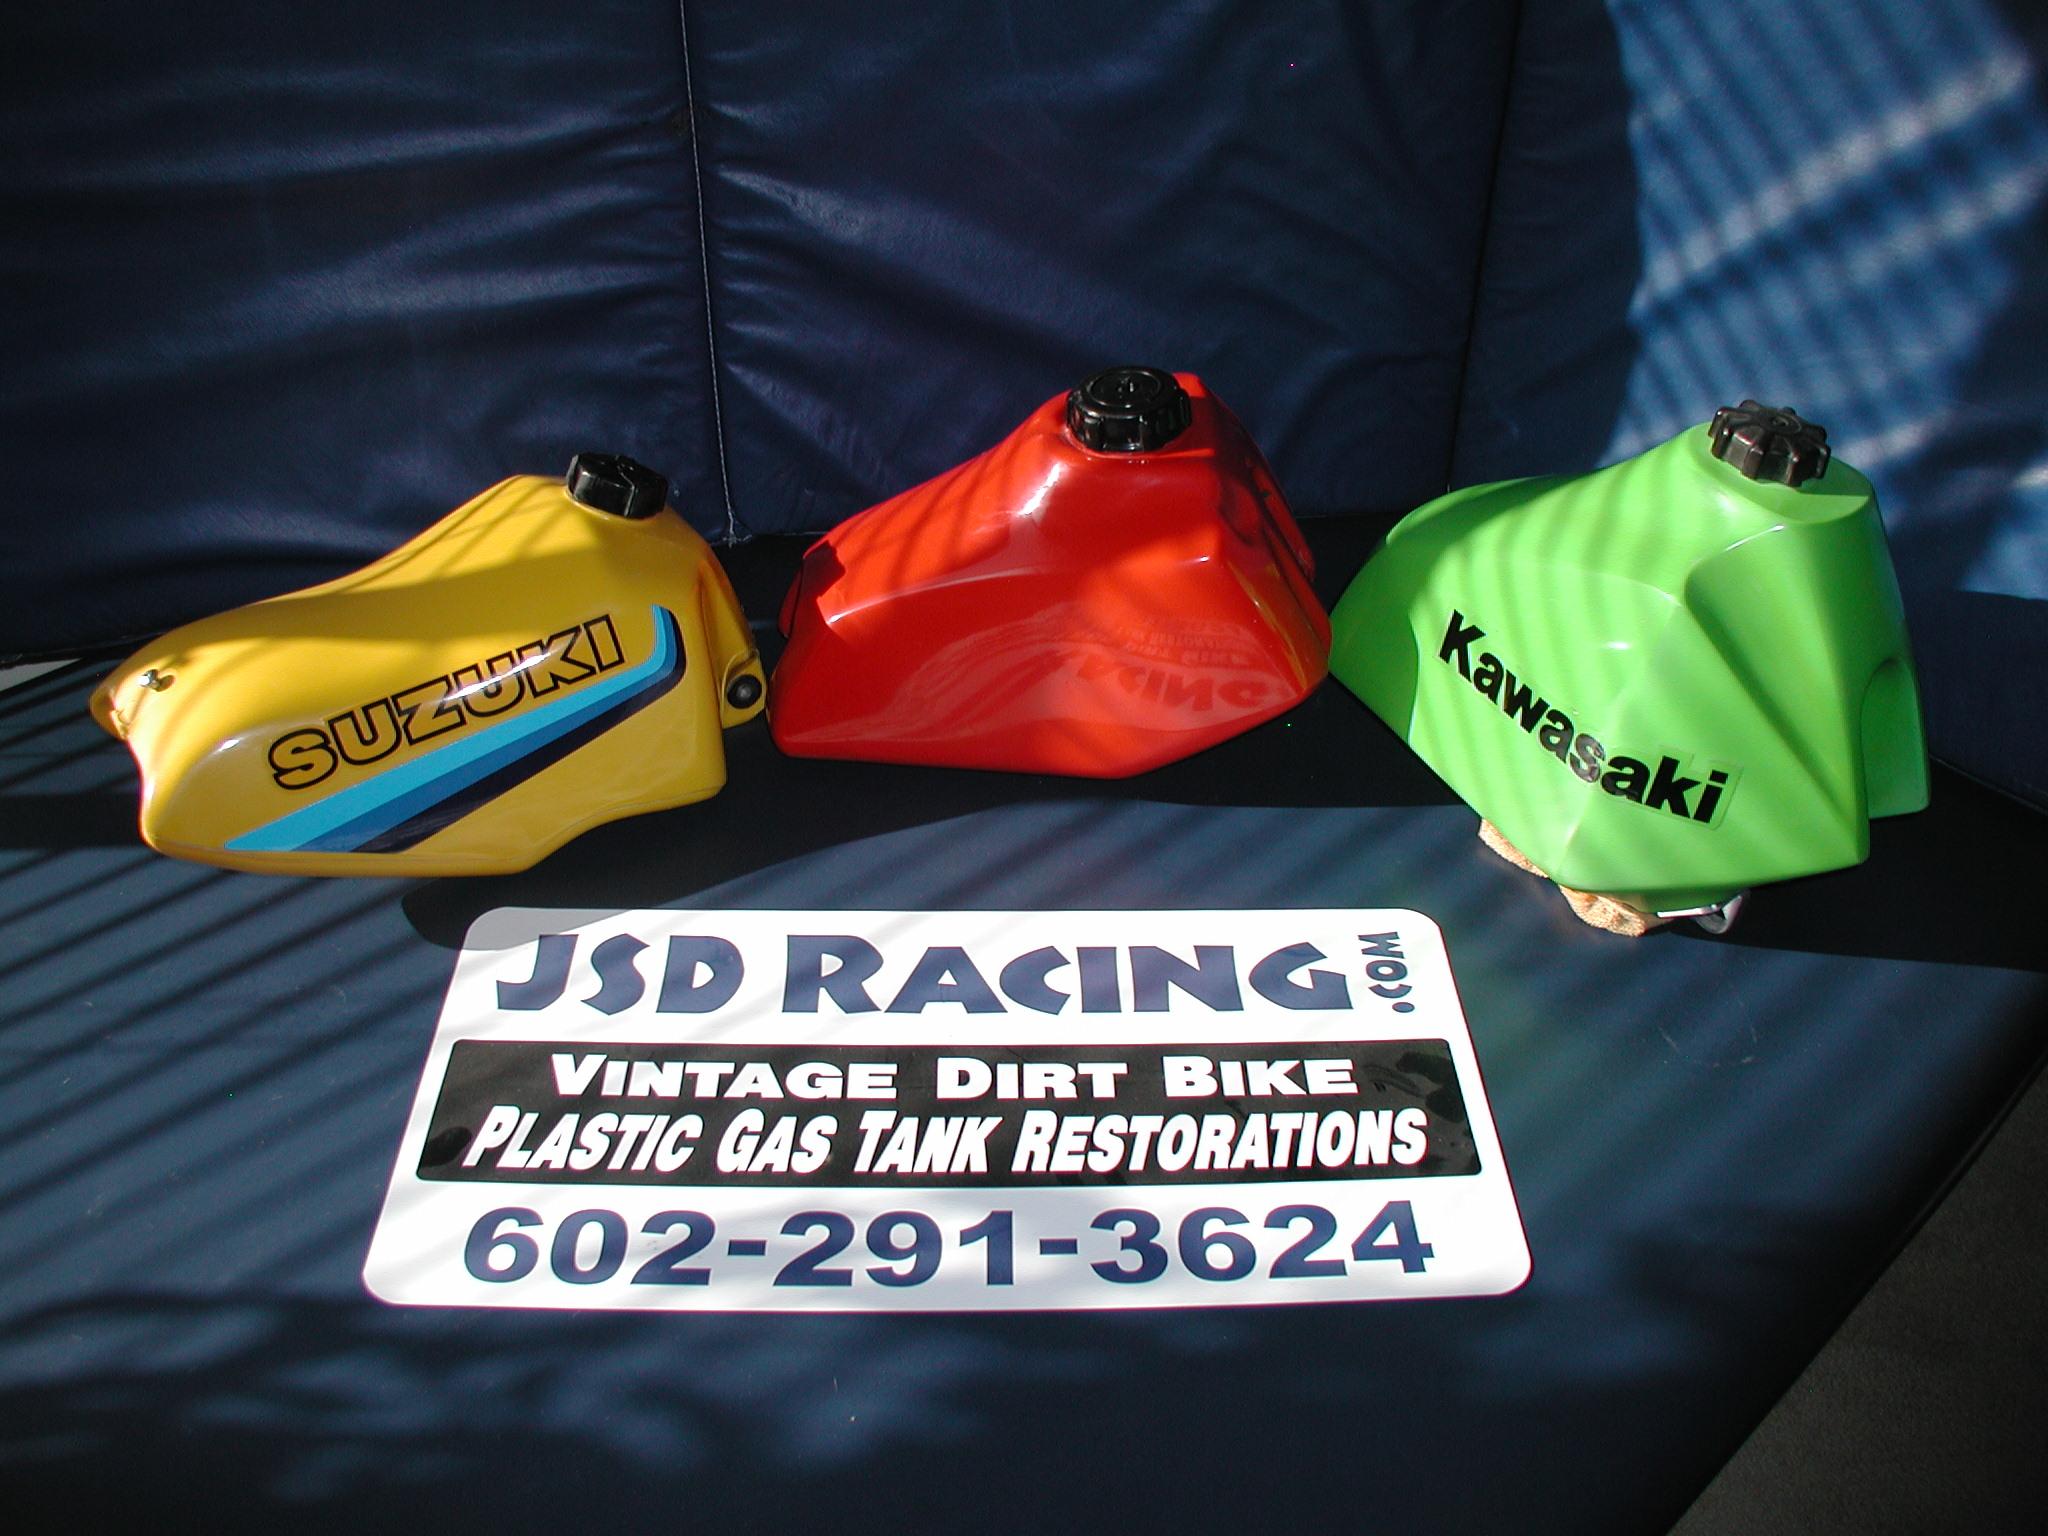 jsdracing.com